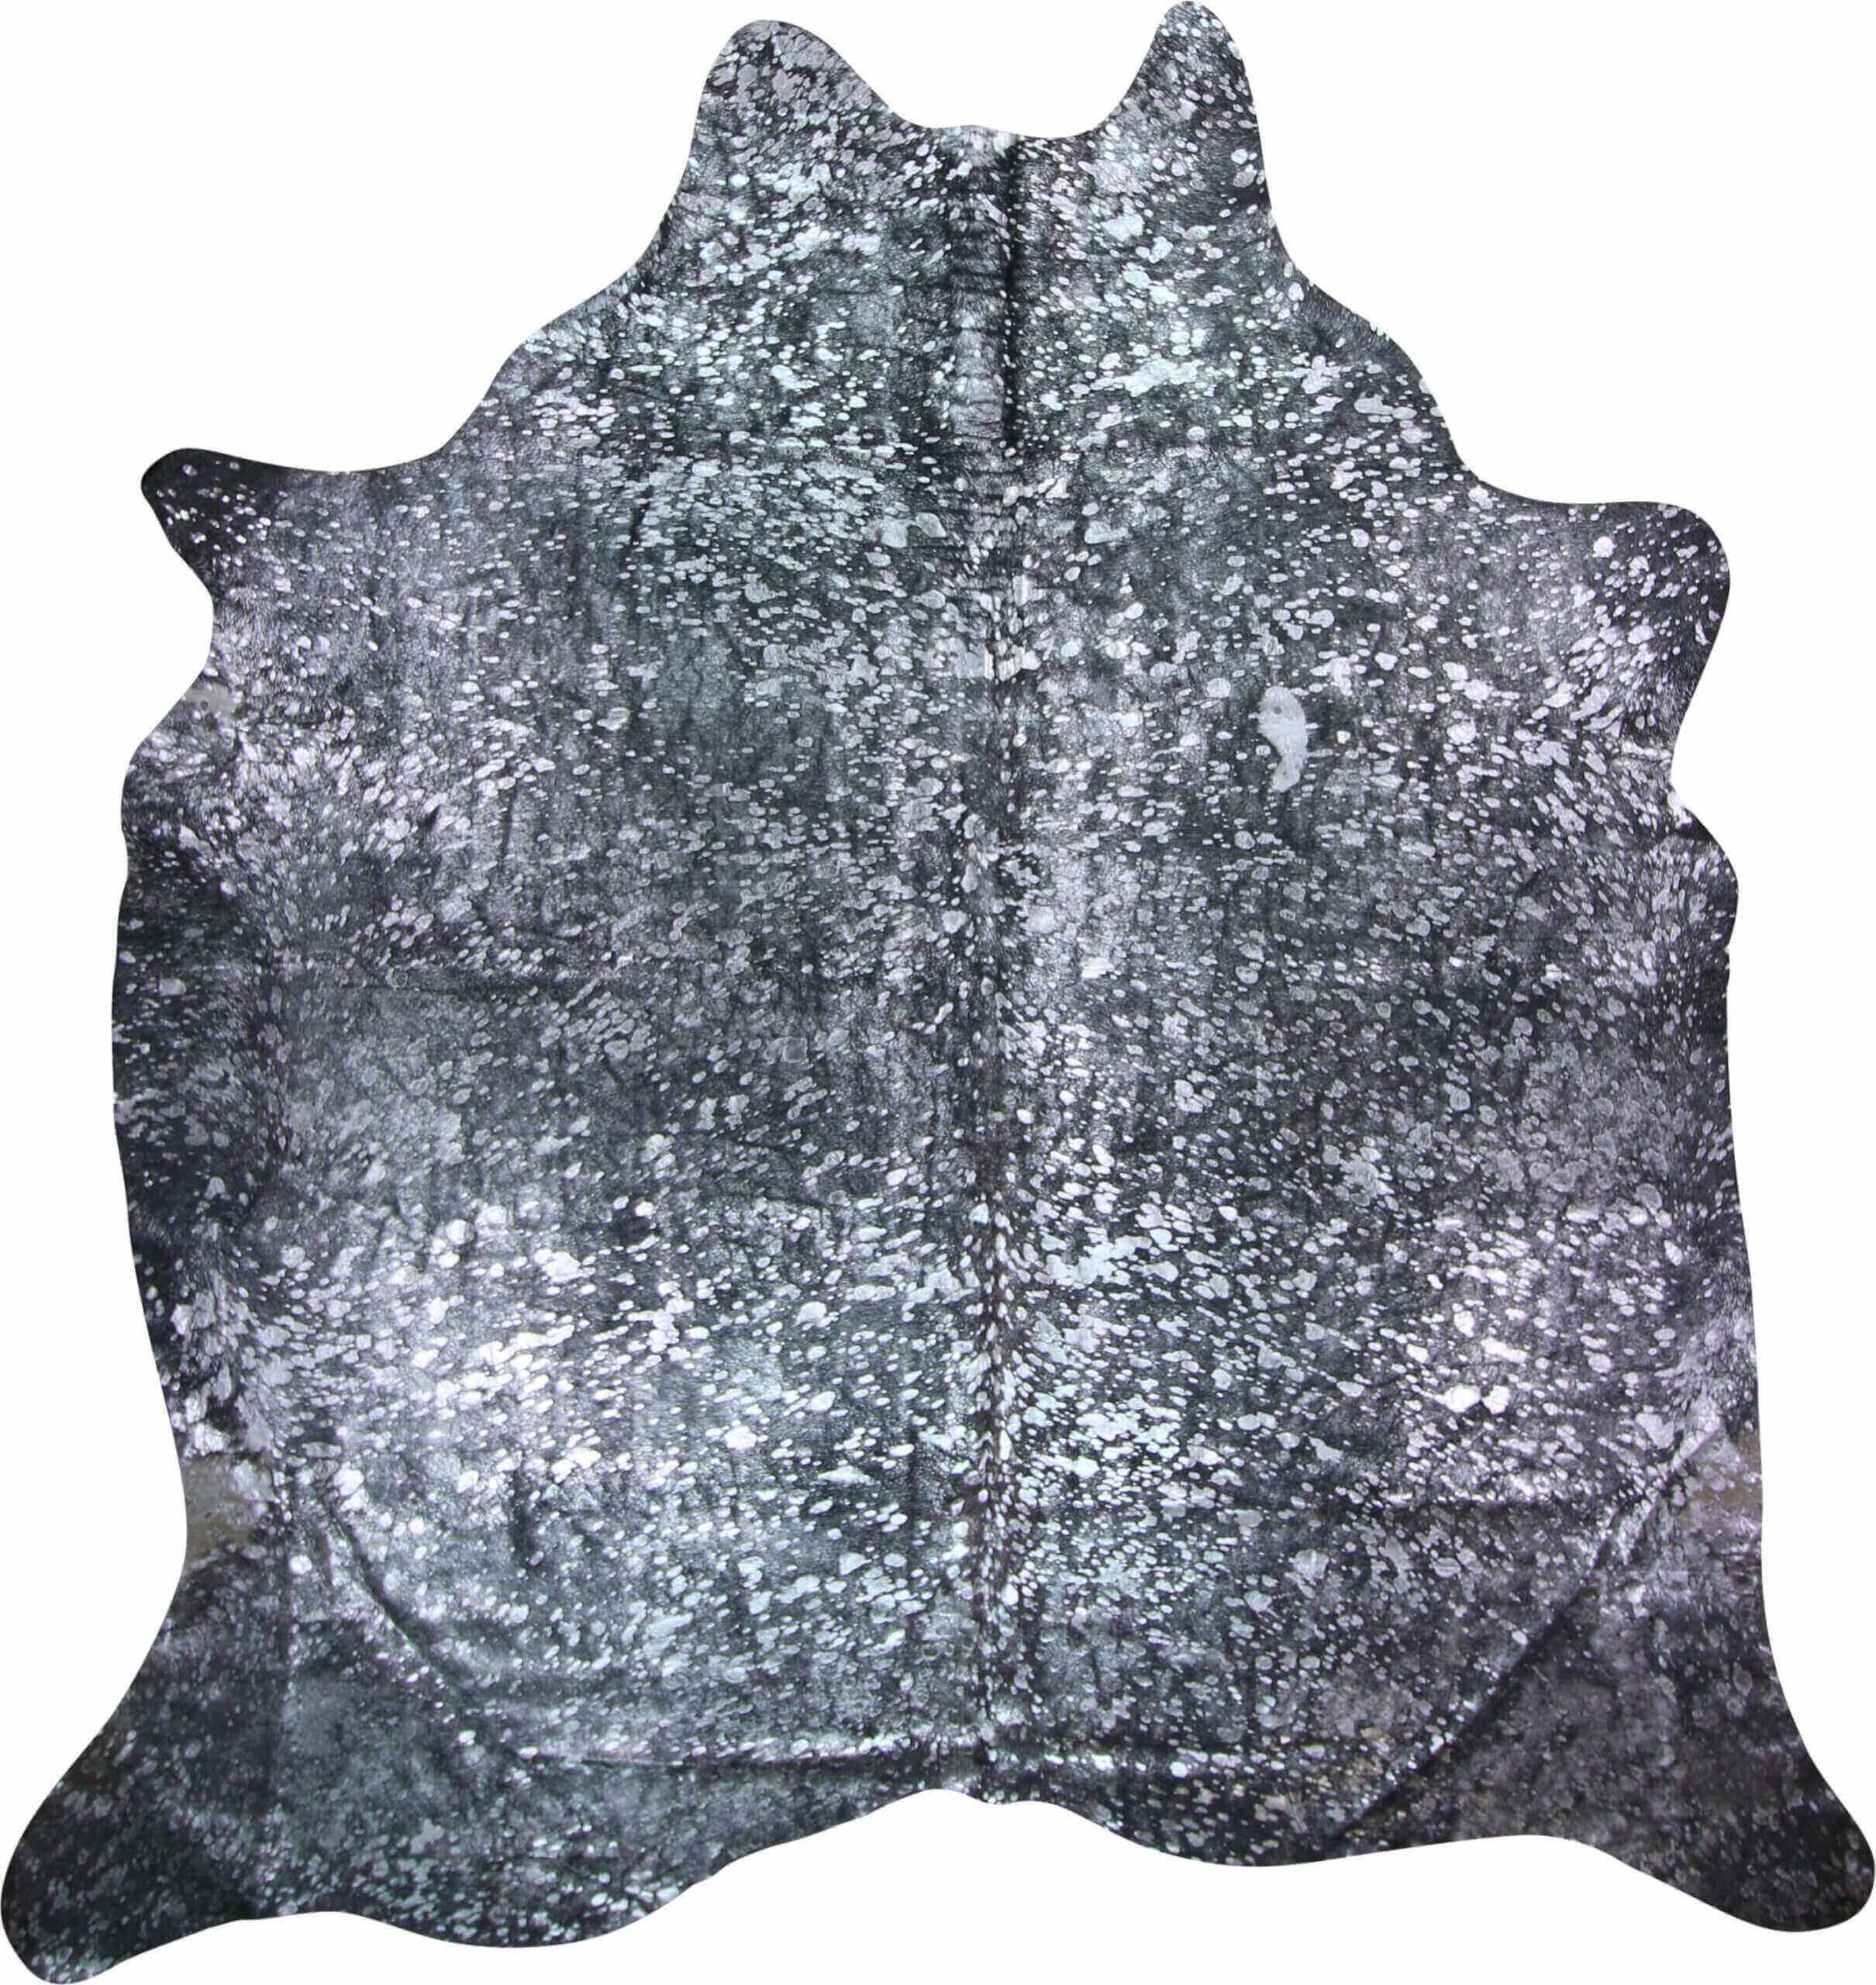 Silver And Grey Metallic Cowhide Rug